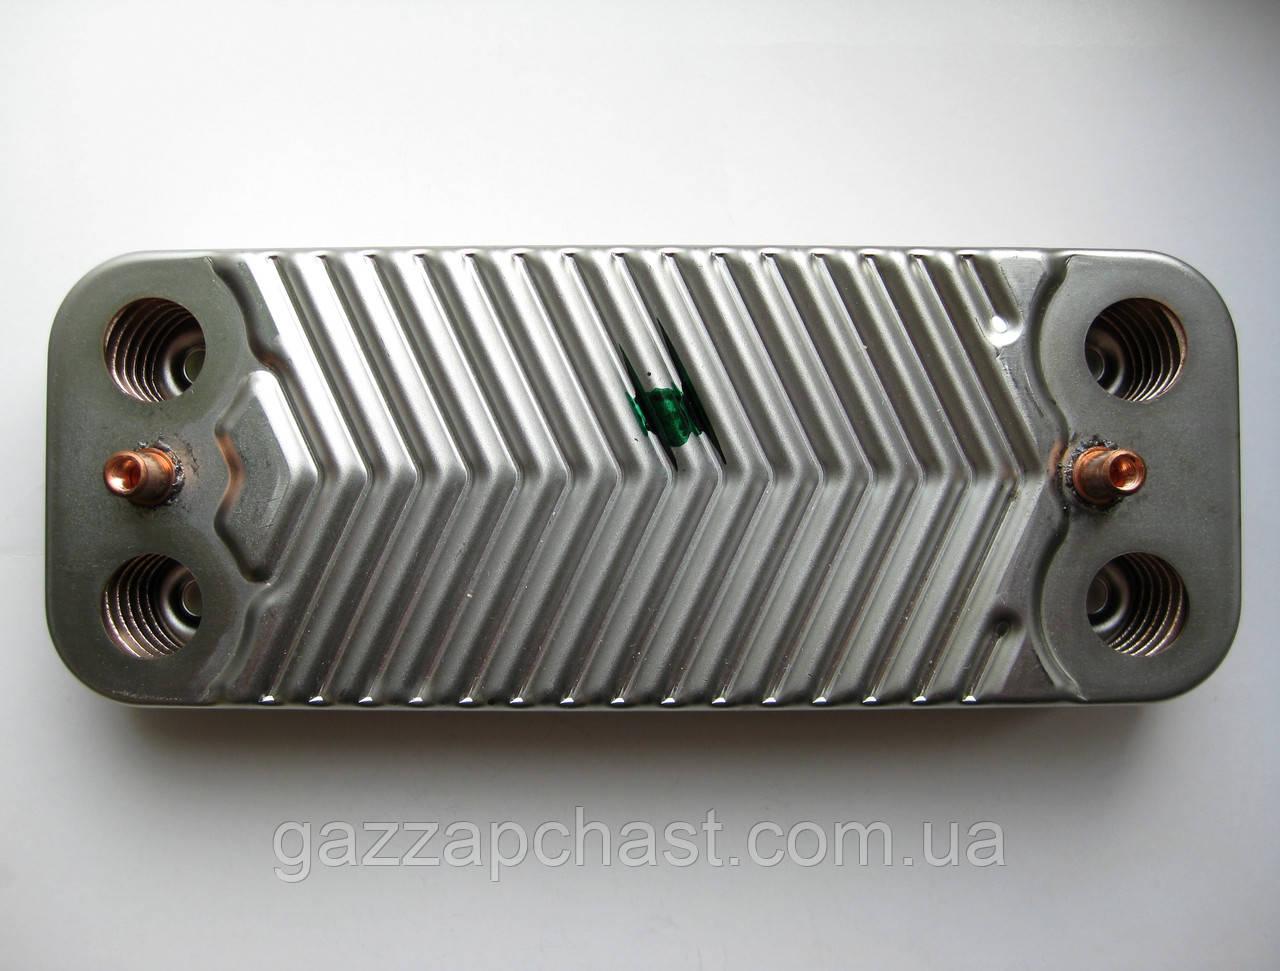 Теплообменник пластинчатый  Solly Primer (12 пл.) (AA10110001)